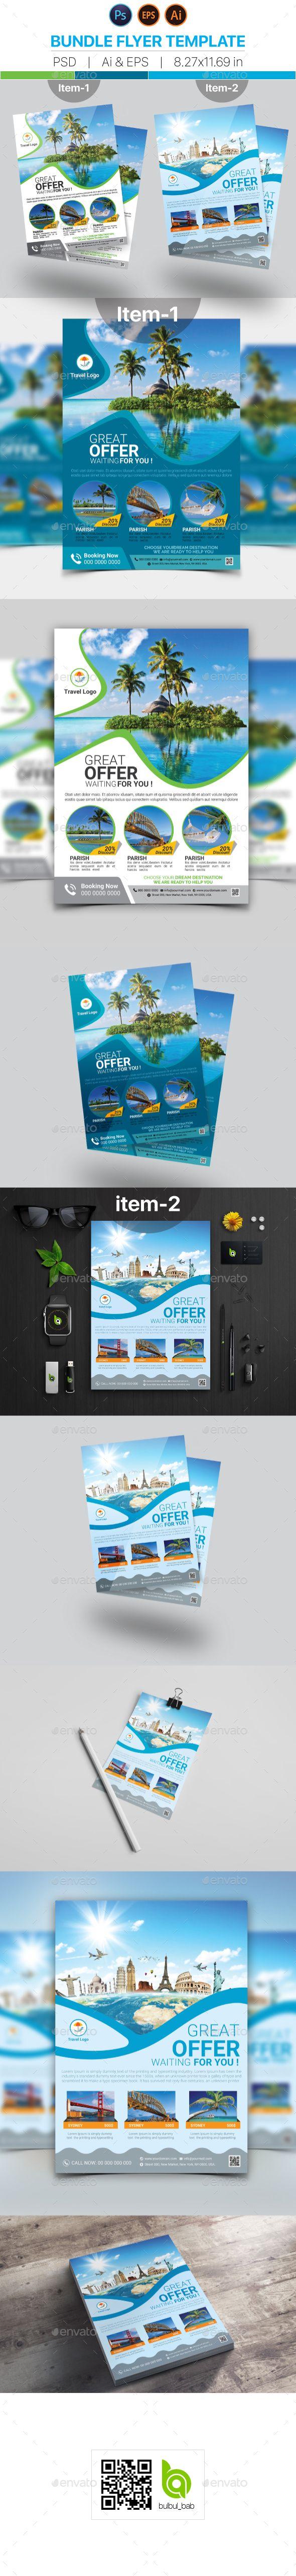 Travel Flyer Template Bundle - PSD, Vector EPS, AI Illustrator